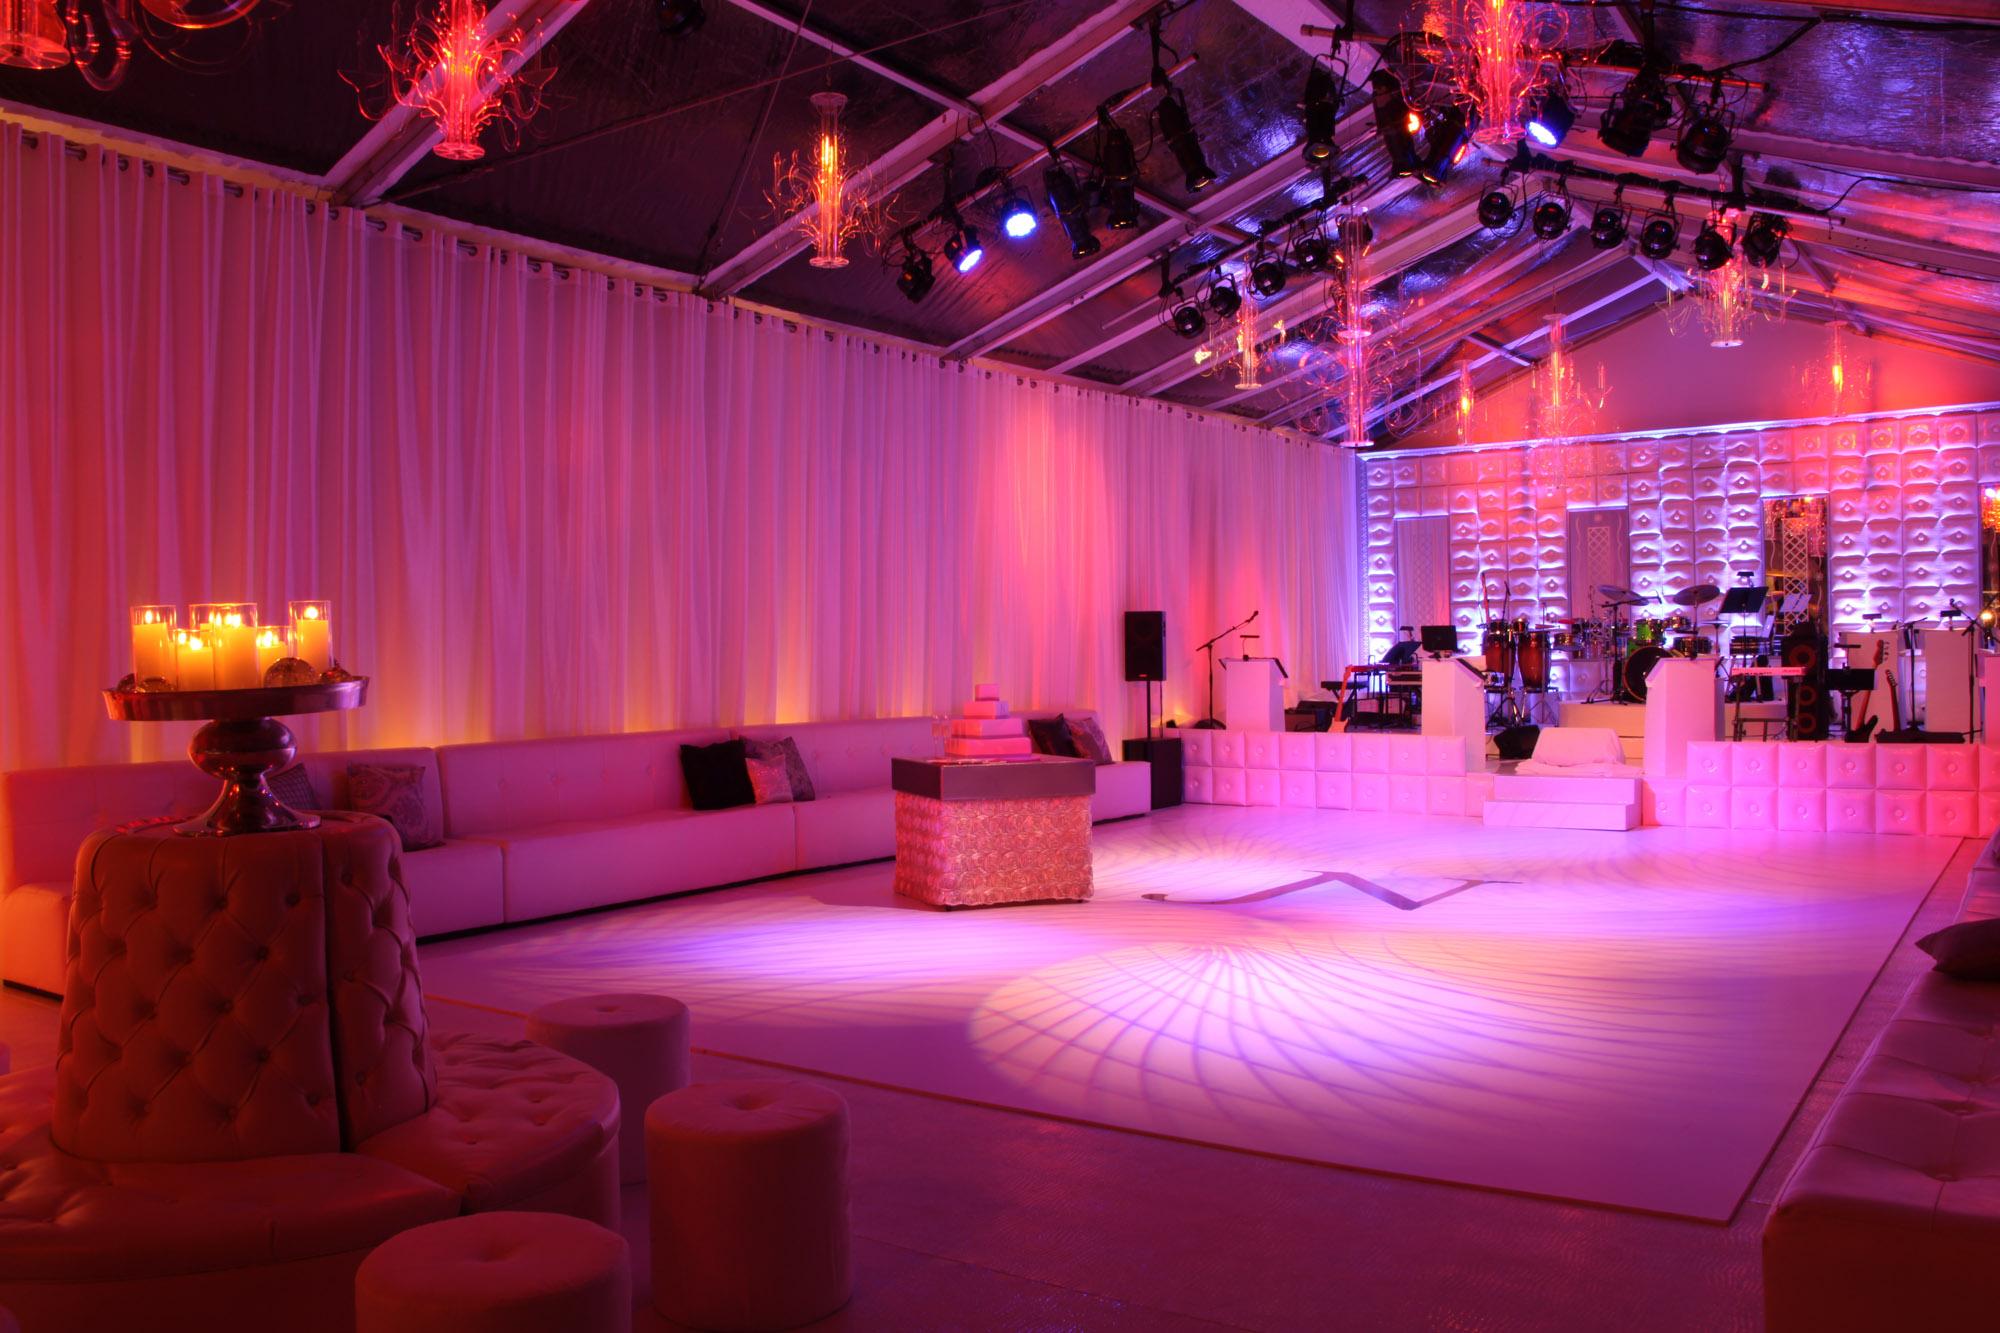 birch-bespoke-events-and-weddings-19.jpg